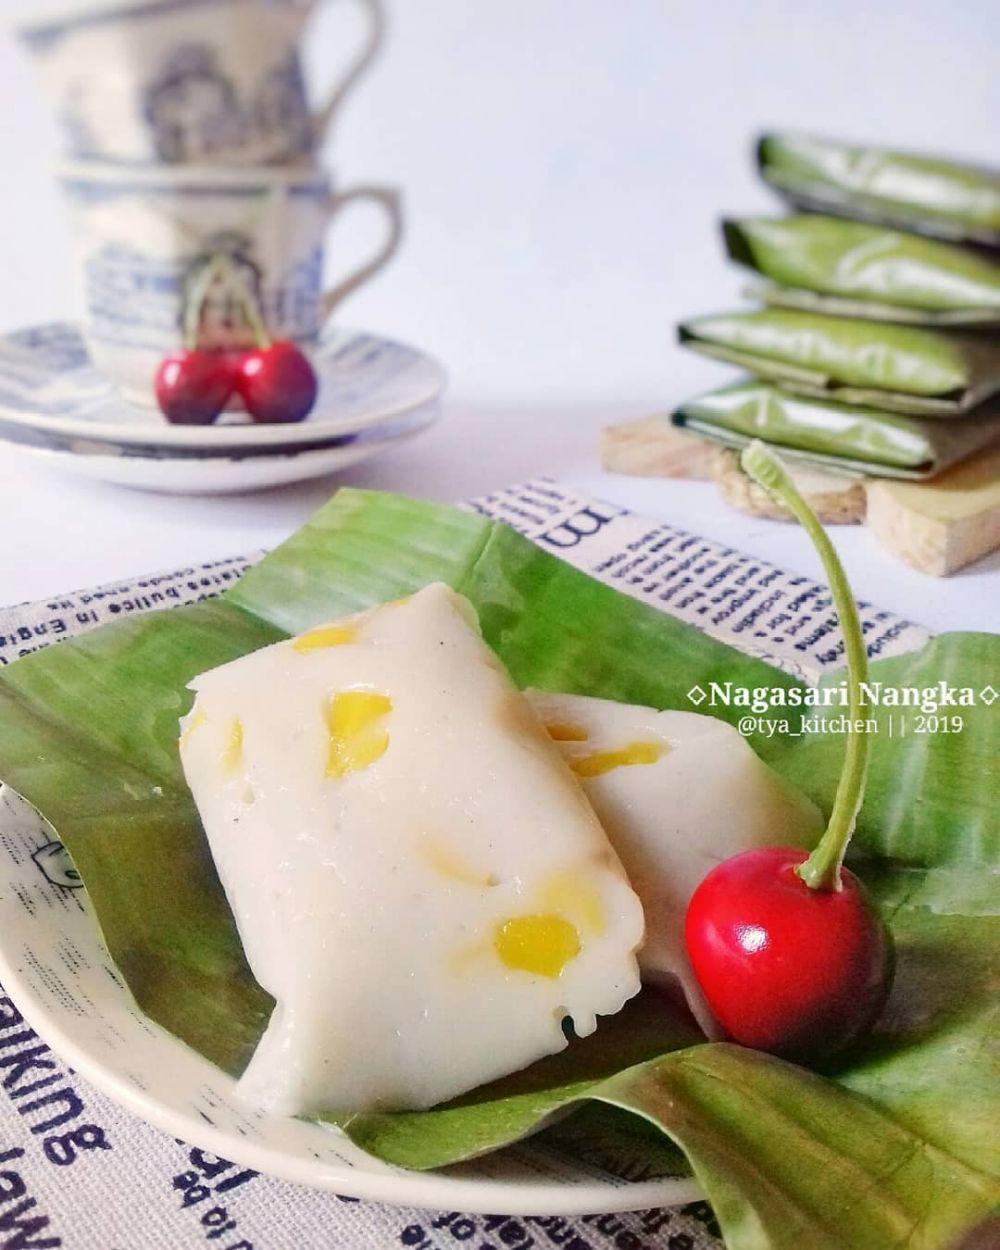 Resep Olahan Nangka Matang Instagram Veronicadhani Endahomemade Resep Masakan Pedas Resep Ide Makanan